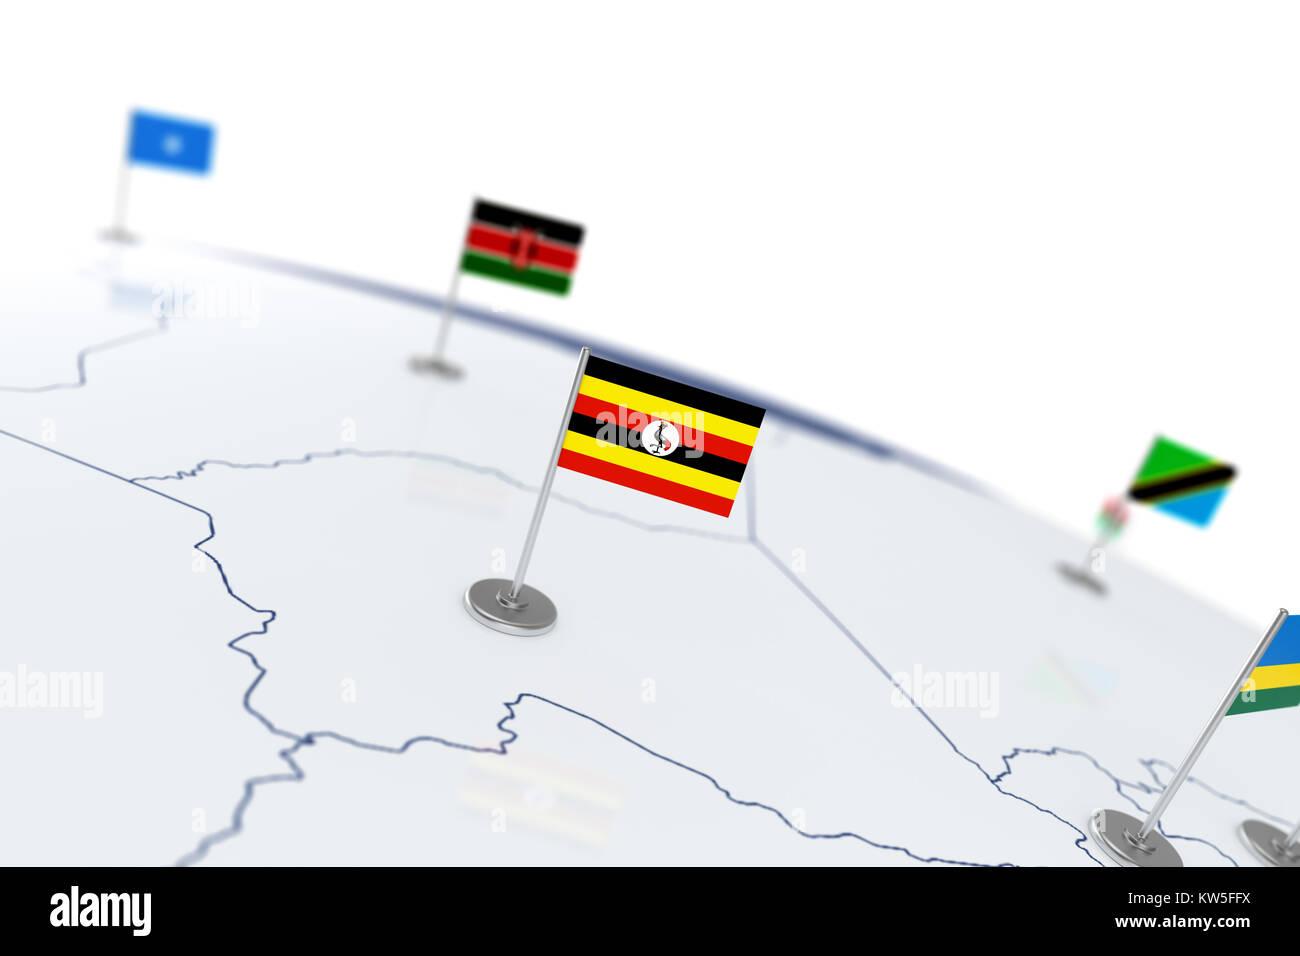 Map flag uganda stock photos map flag uganda stock images alamy uganda flag country flag with chrome flagpole on the world map with neighbors countries borders sciox Images